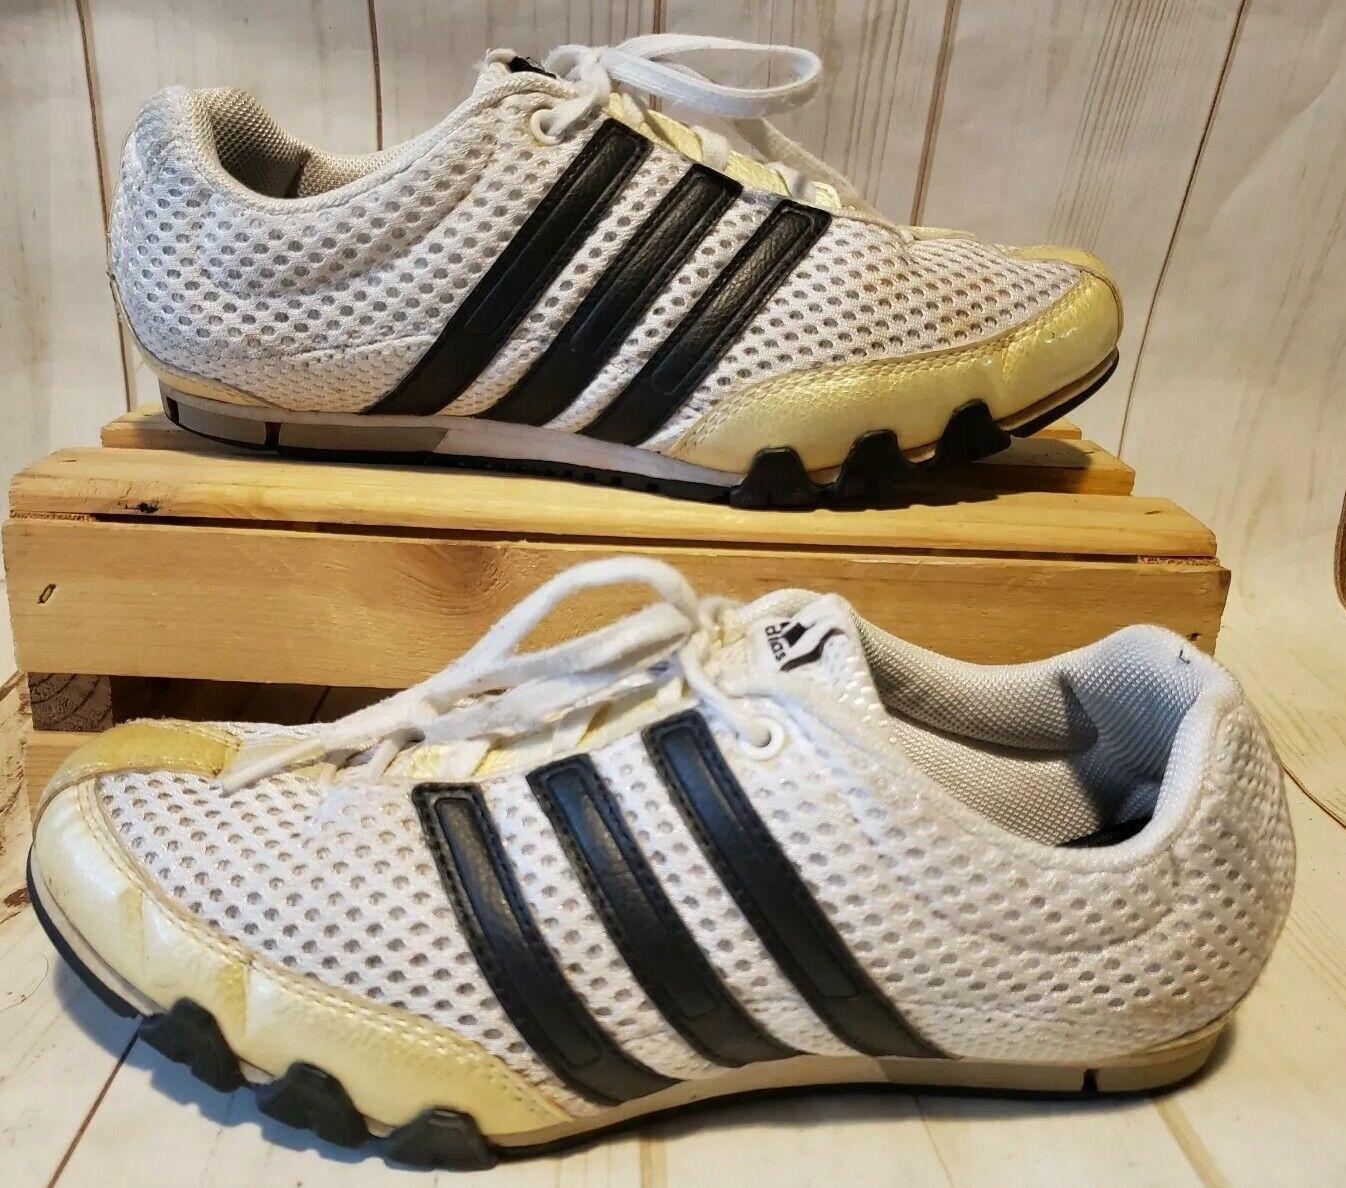 Adidas yya 606001 track   scarpe da corsa - maglie bianco   argentoo donne misura 6,5 | Di Alta Qualità  | Uomo/Donna Scarpa